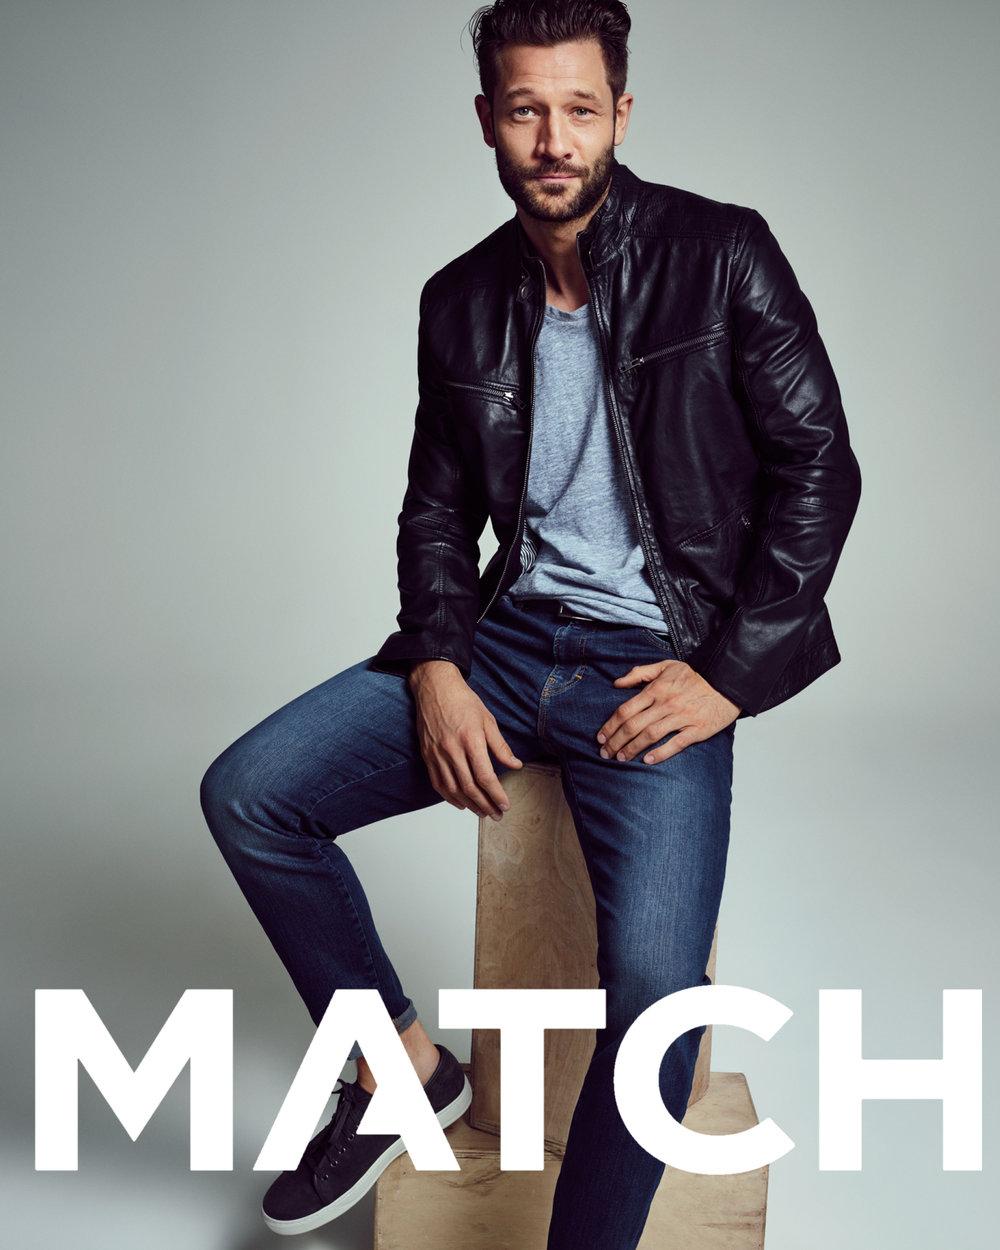 match112.jpg